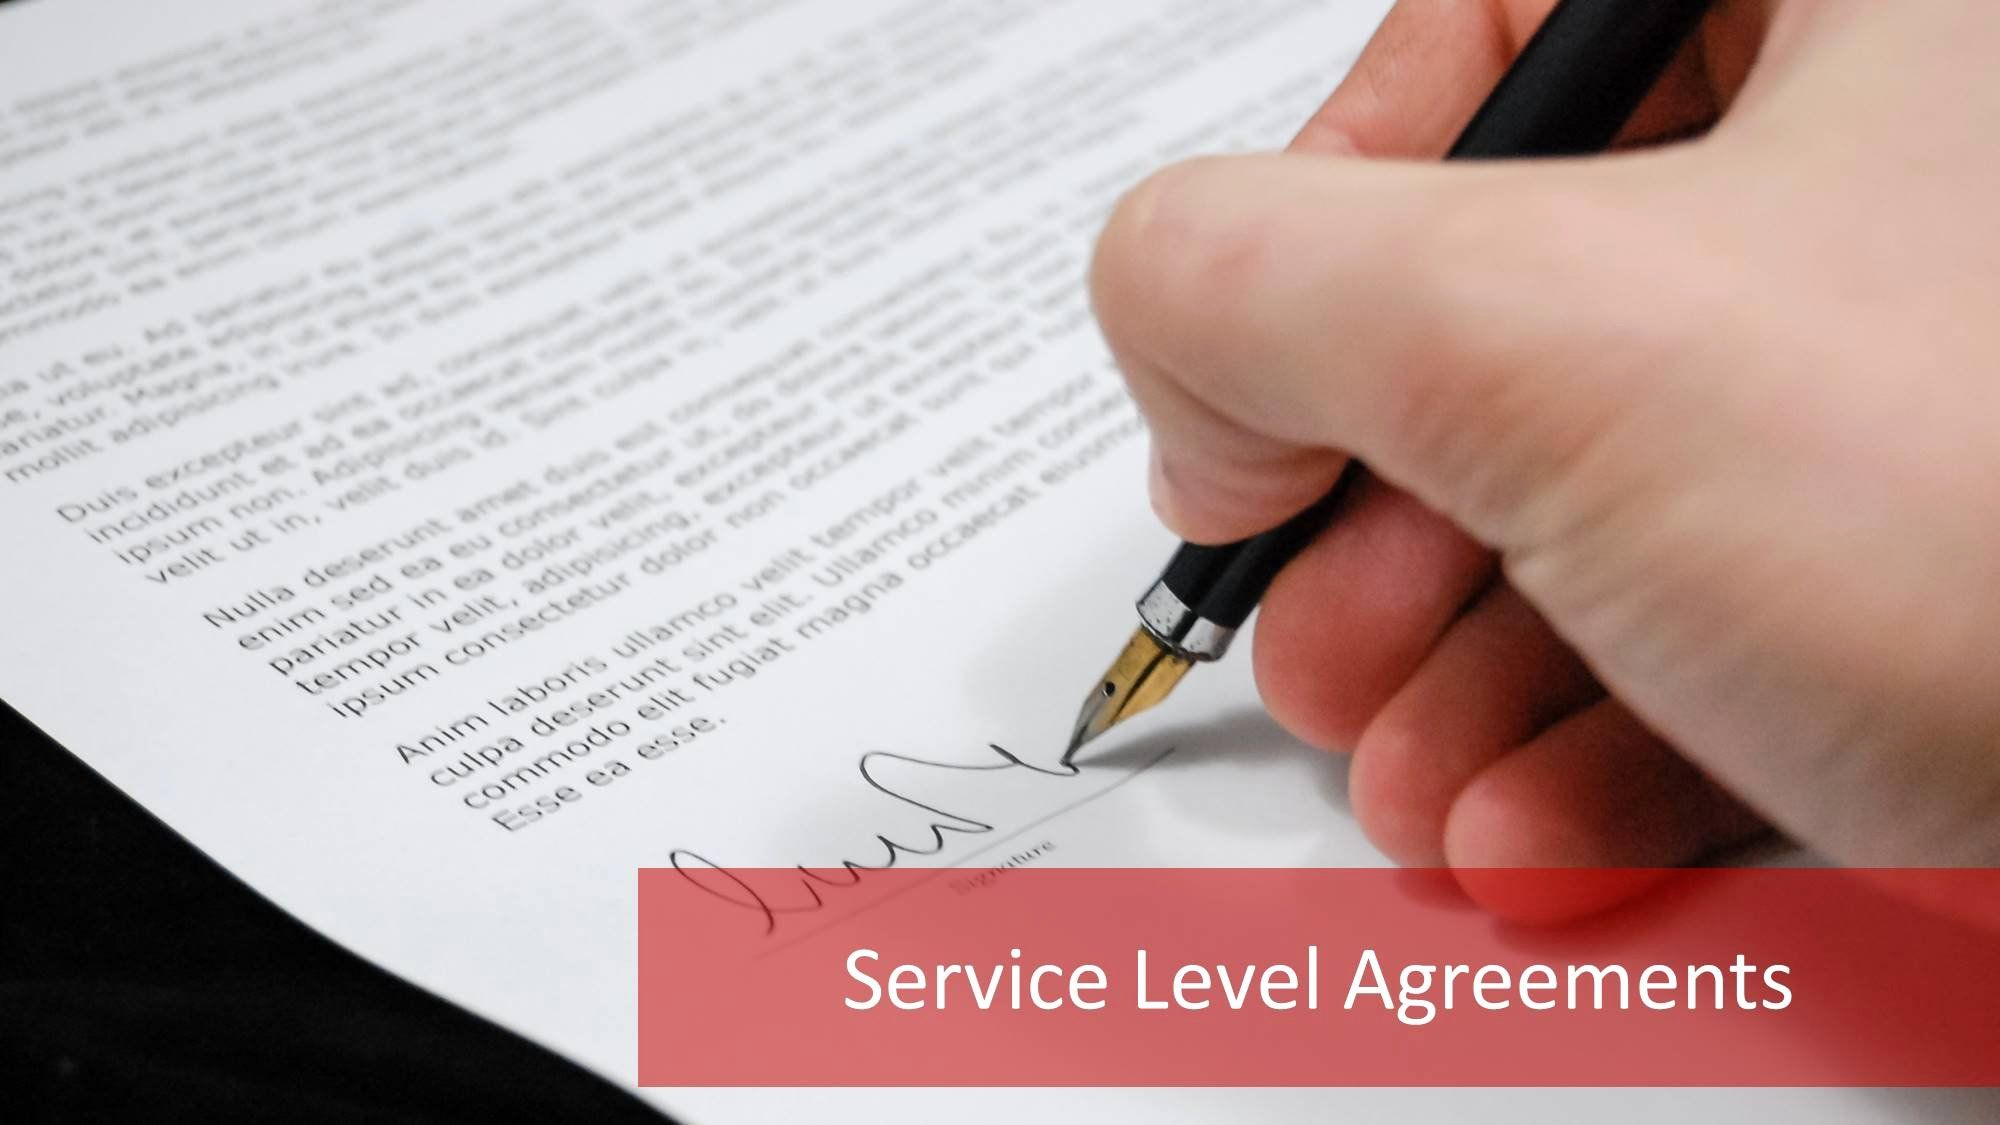 Bank Vendor Risk Assessment Template In 2020 Service Level